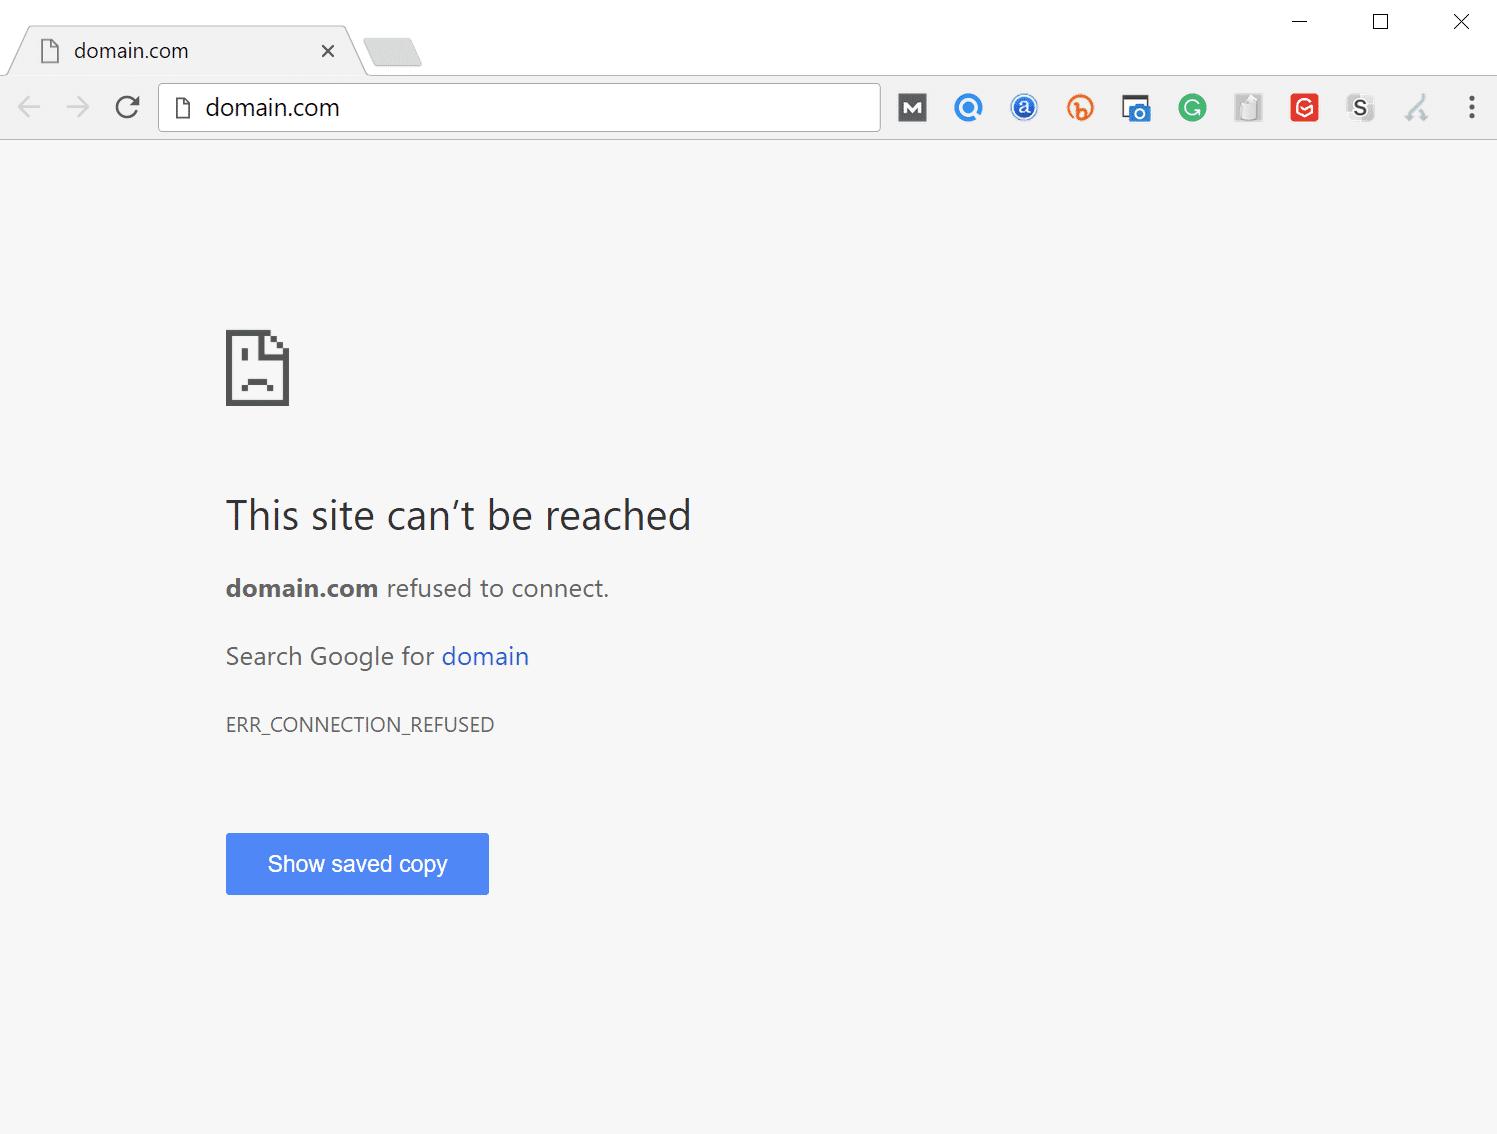 ERR_CONNECTION_REFUSED dans Google Chrome